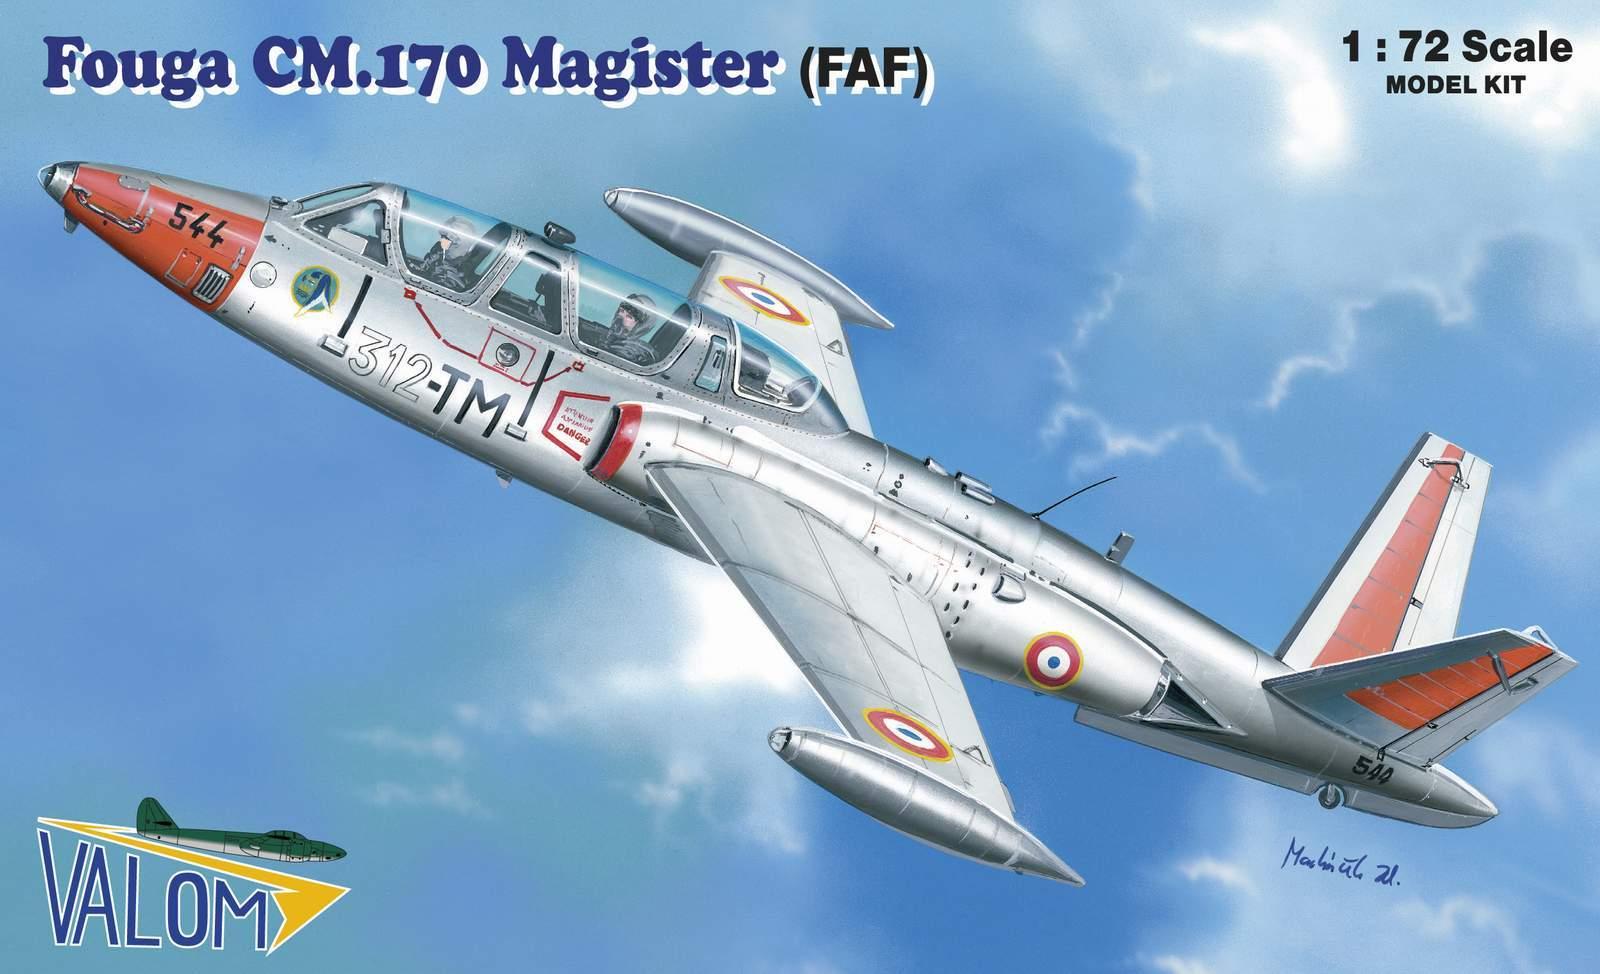 Valom Fouga CM.170 Magister (FAF)